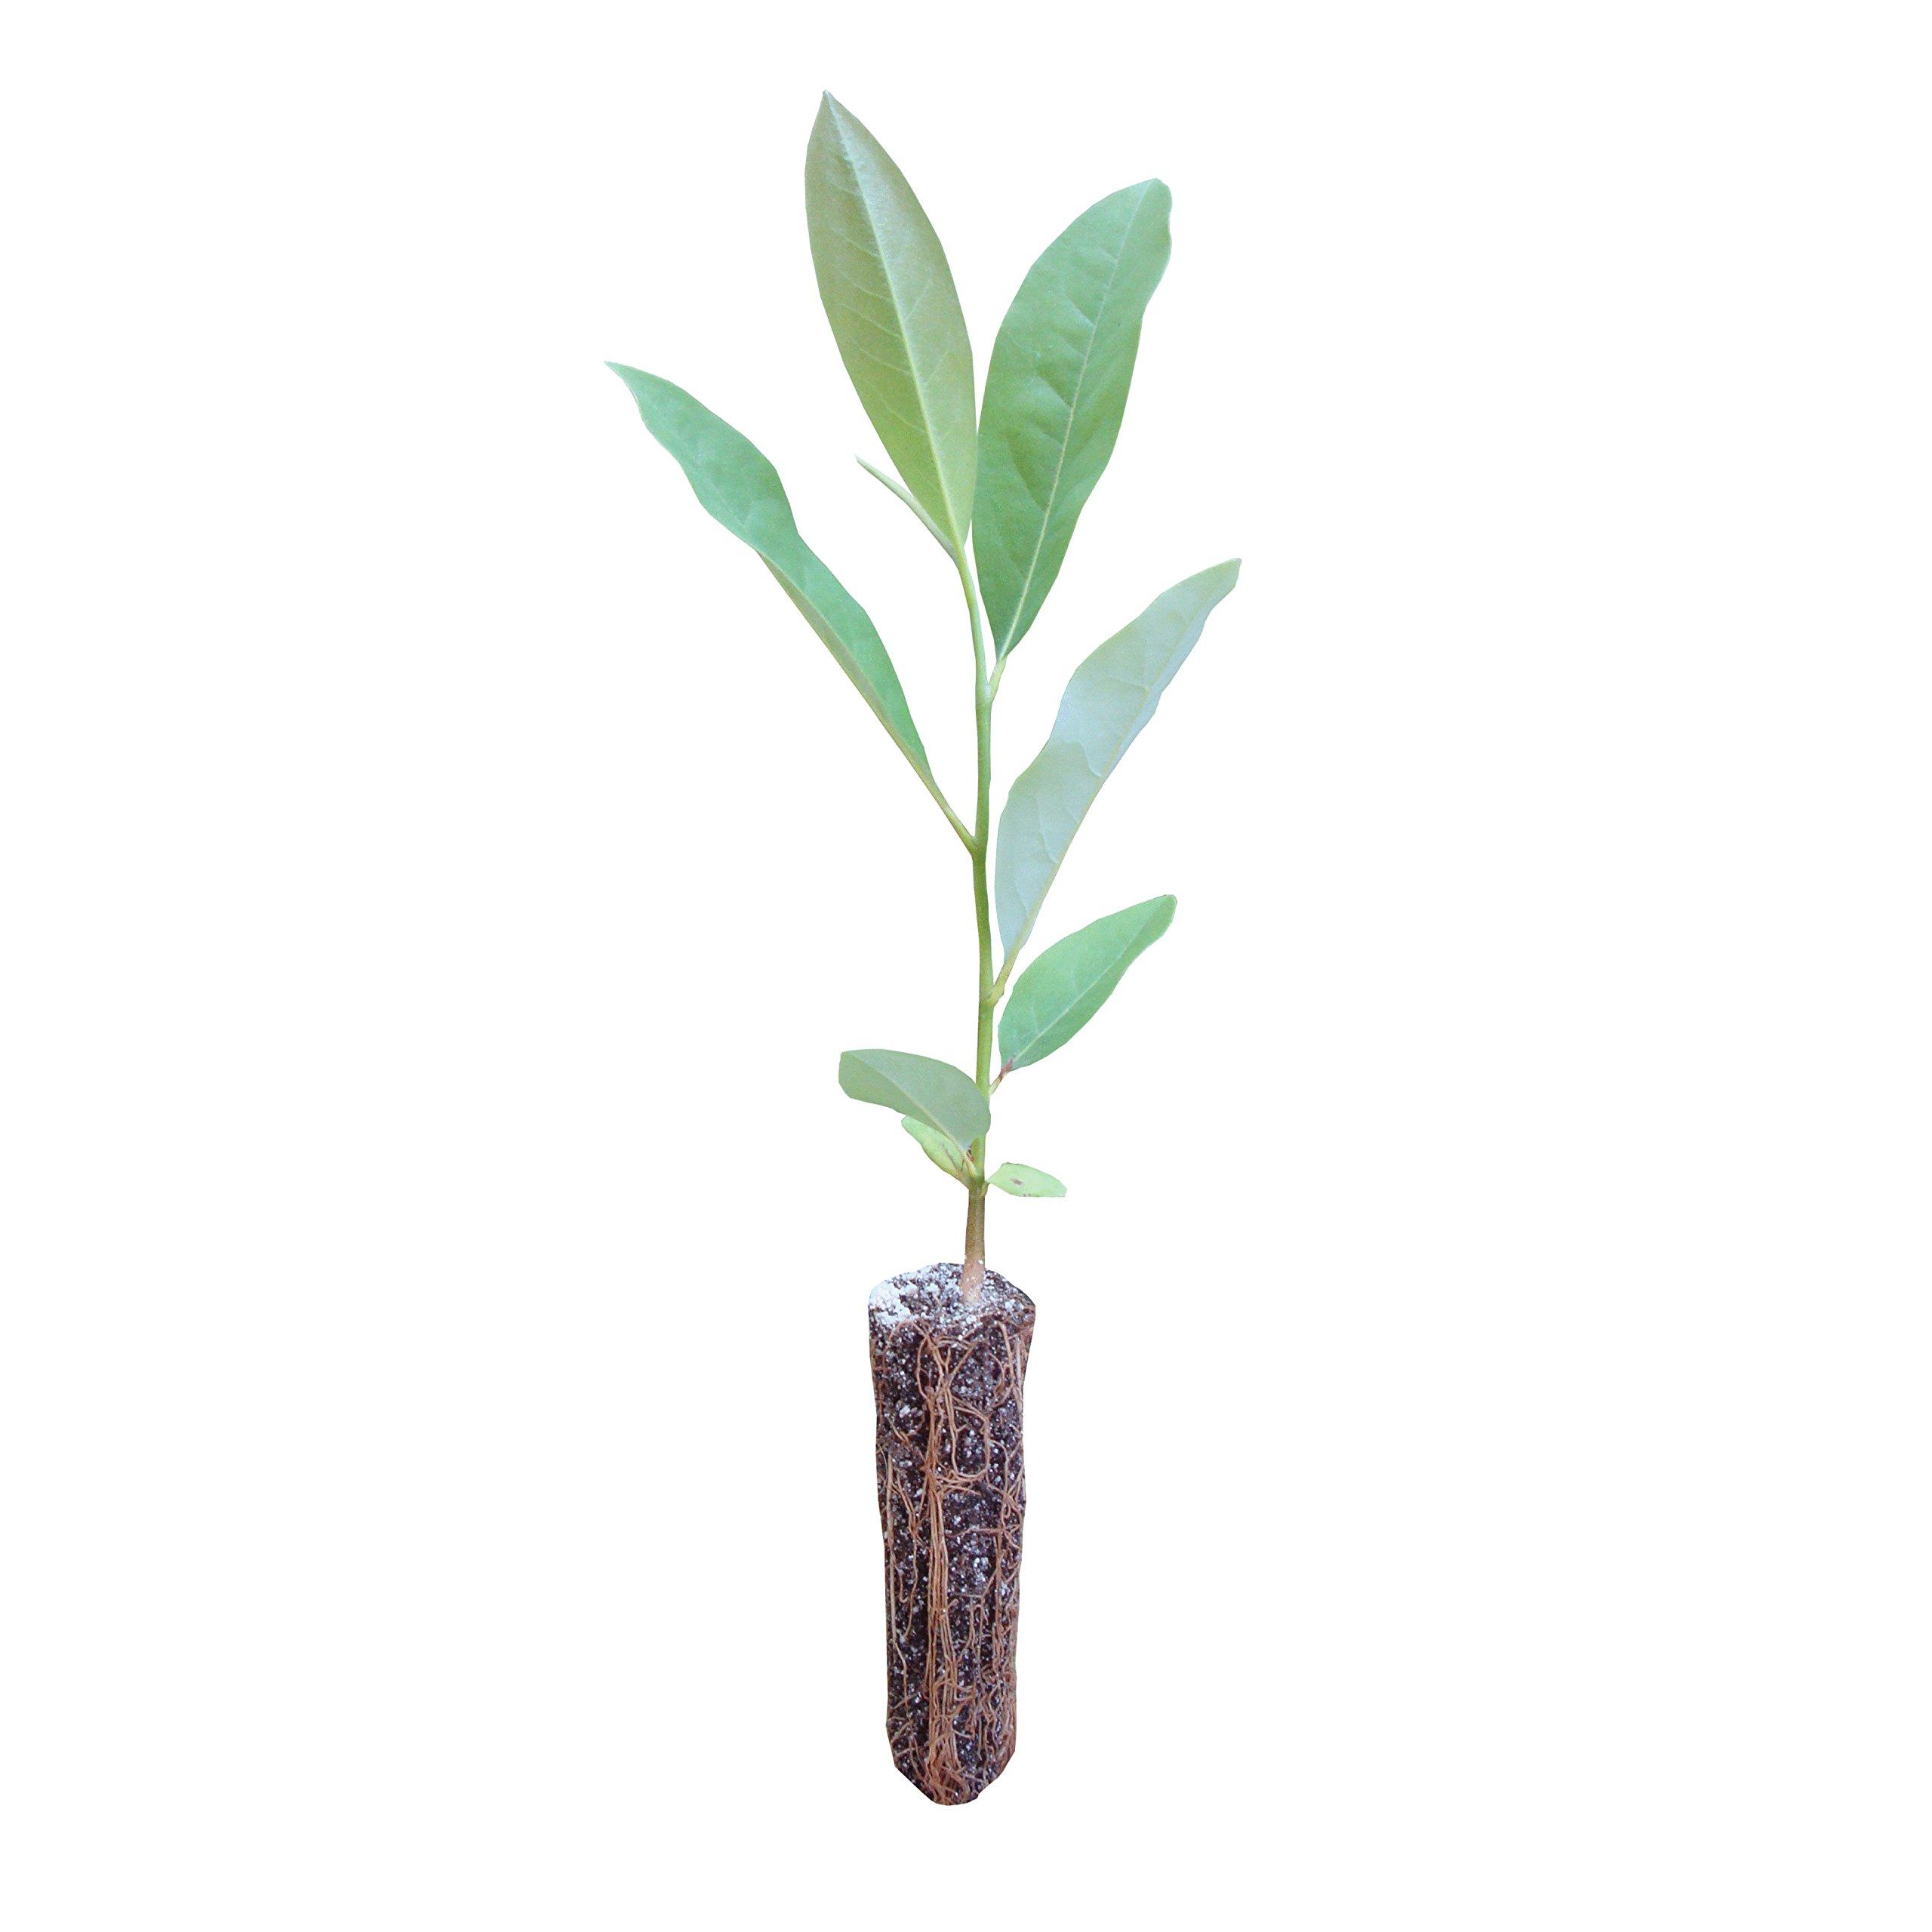 Sweetbay Magnolia | Live Tree Seedling (Medium) | The Jonsteen Company